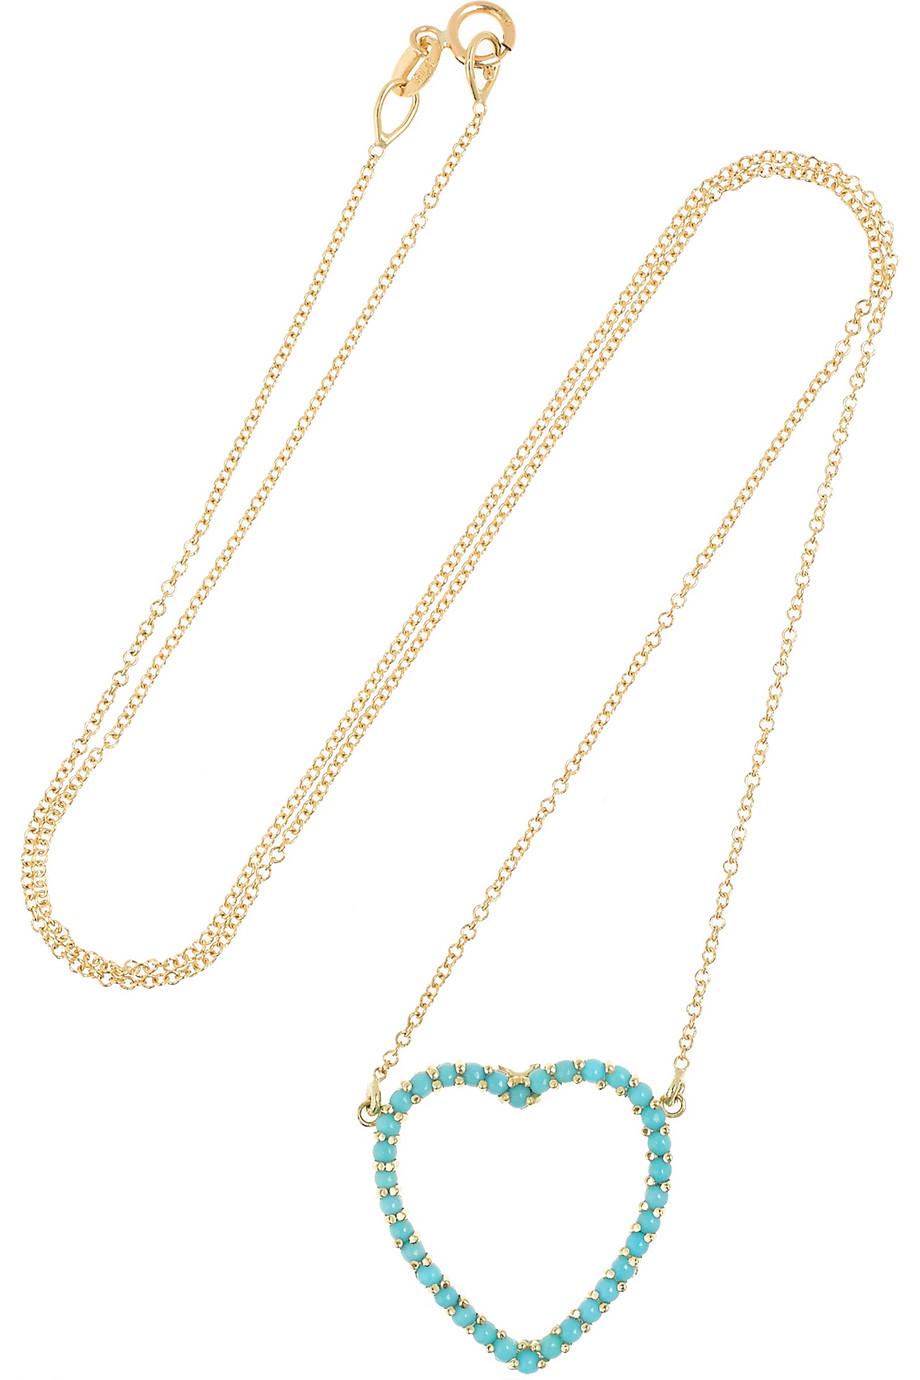 Jennifer Meyer Open Heart 18-karat Gold Turquoise Necklace ppqmpJQ1